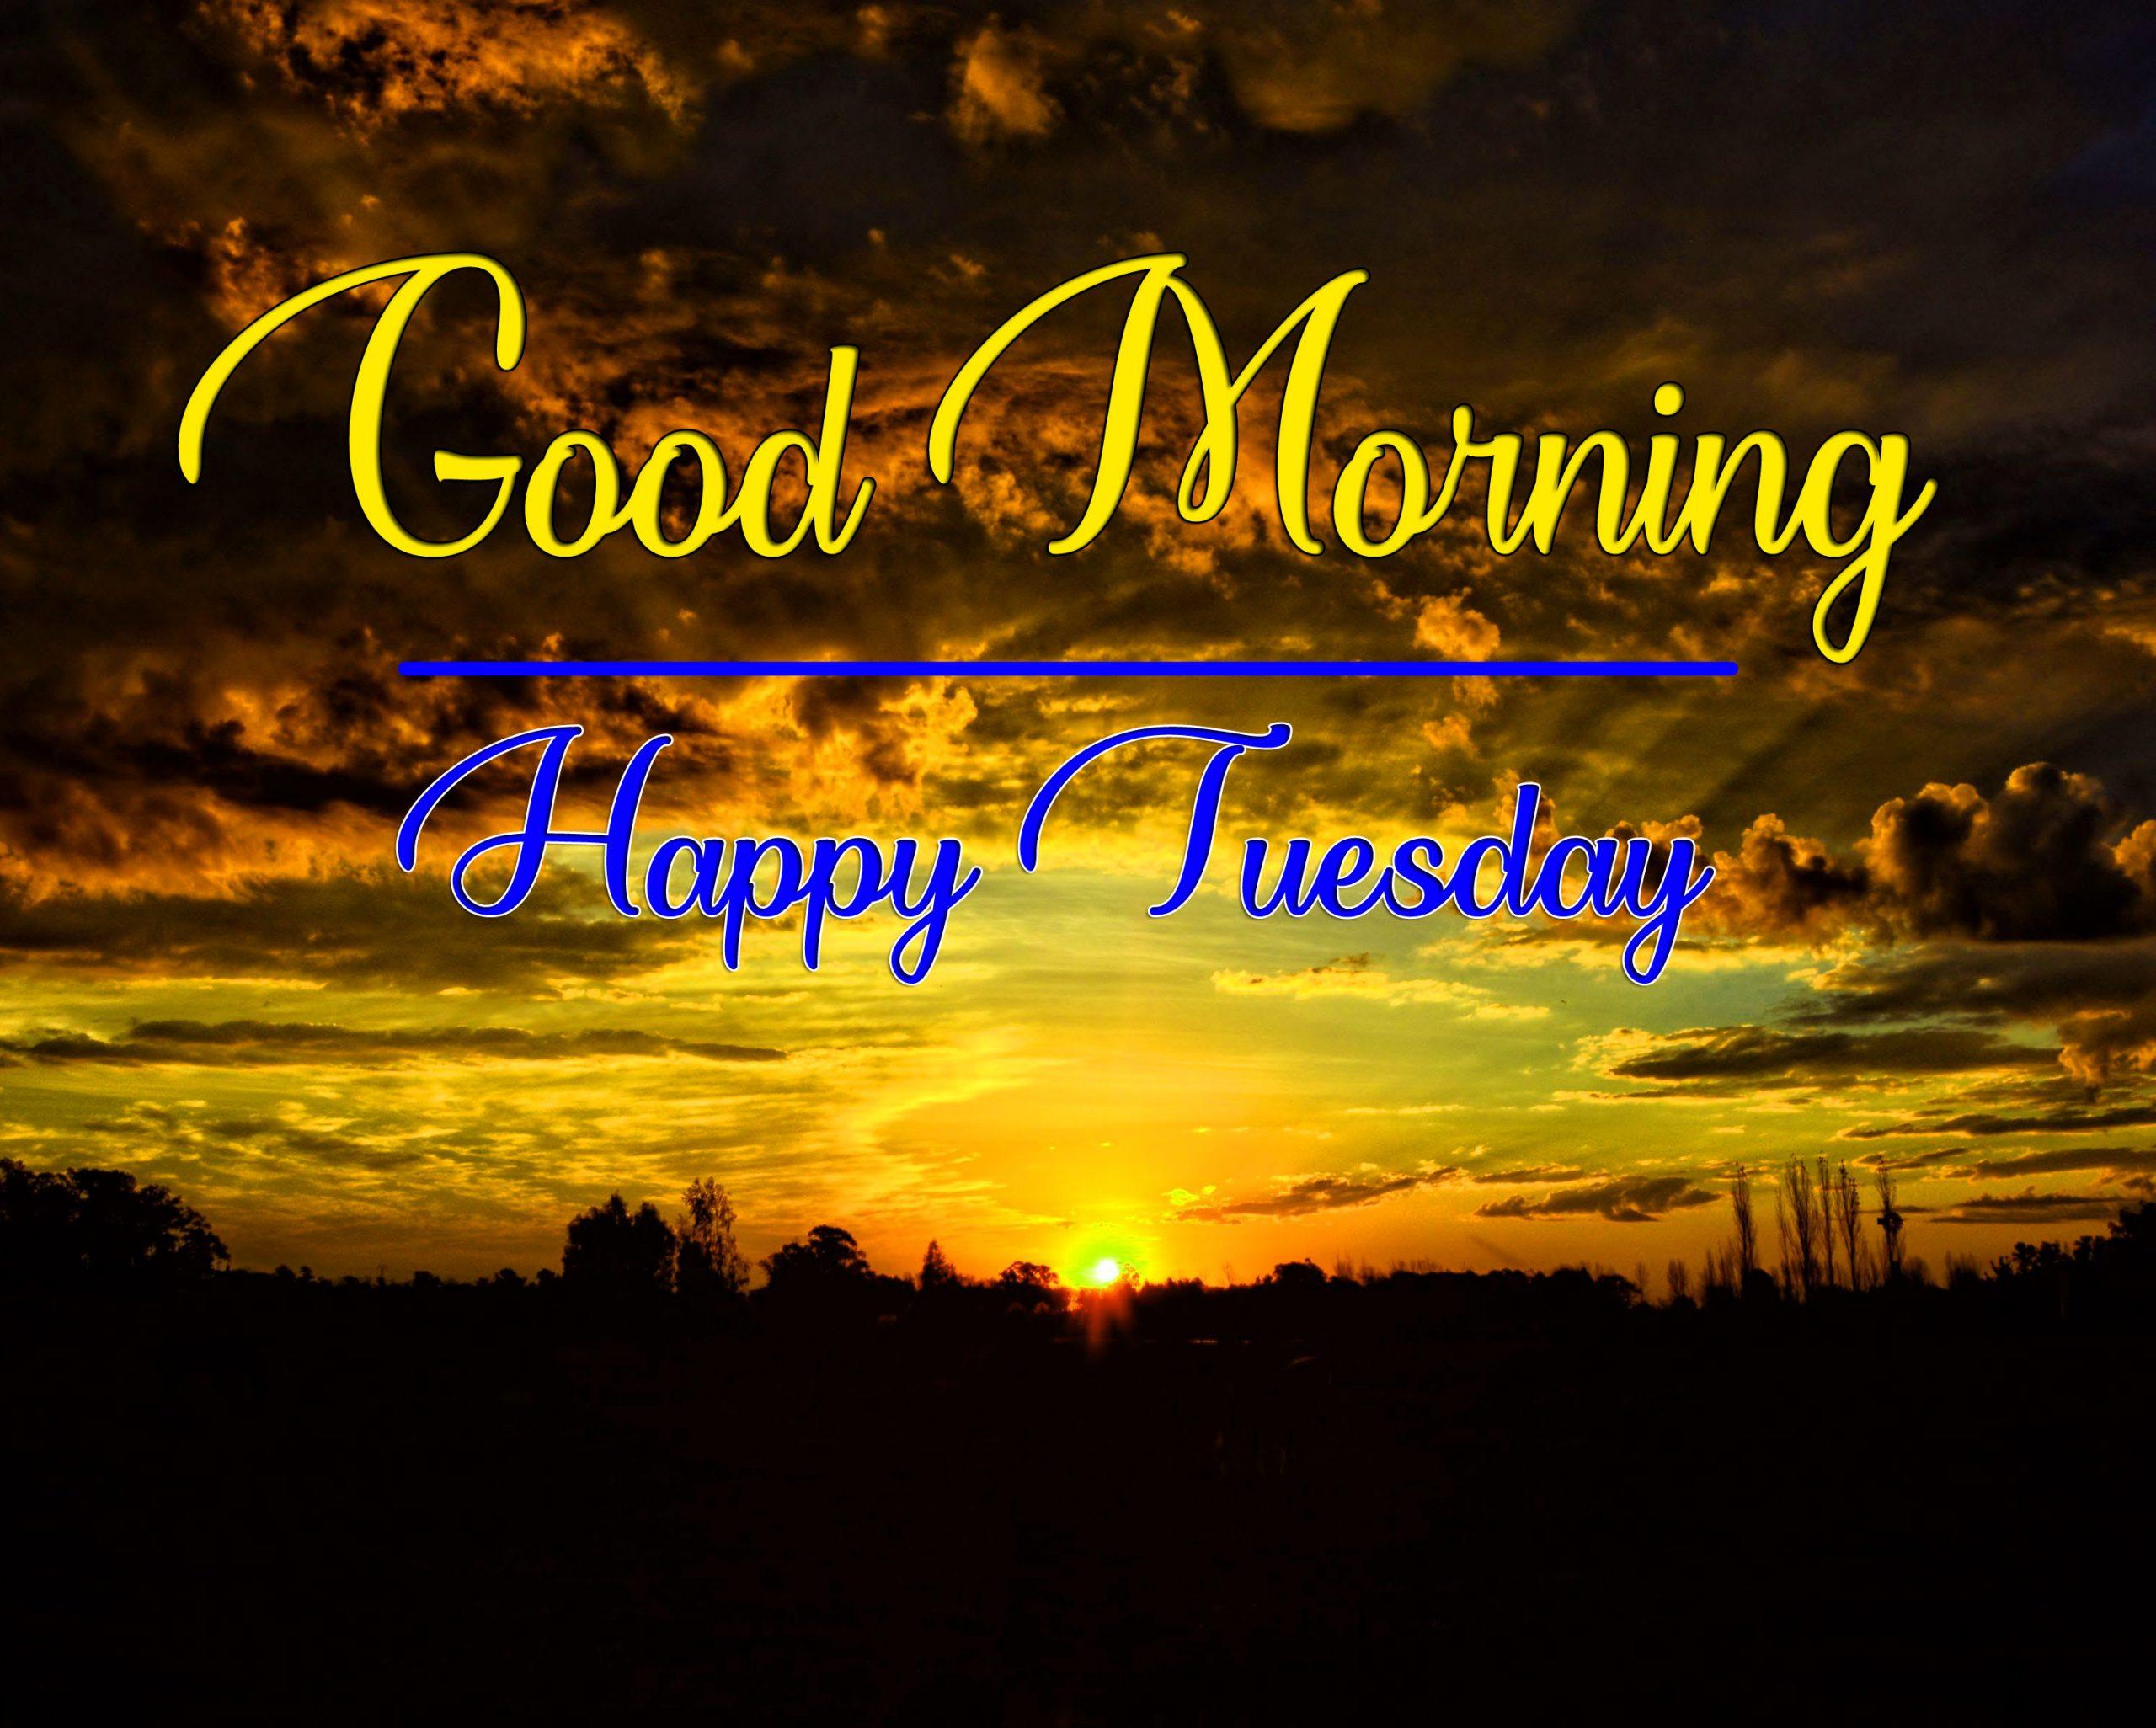 Beatiful Beautiful Tuesday Good morning Images 1